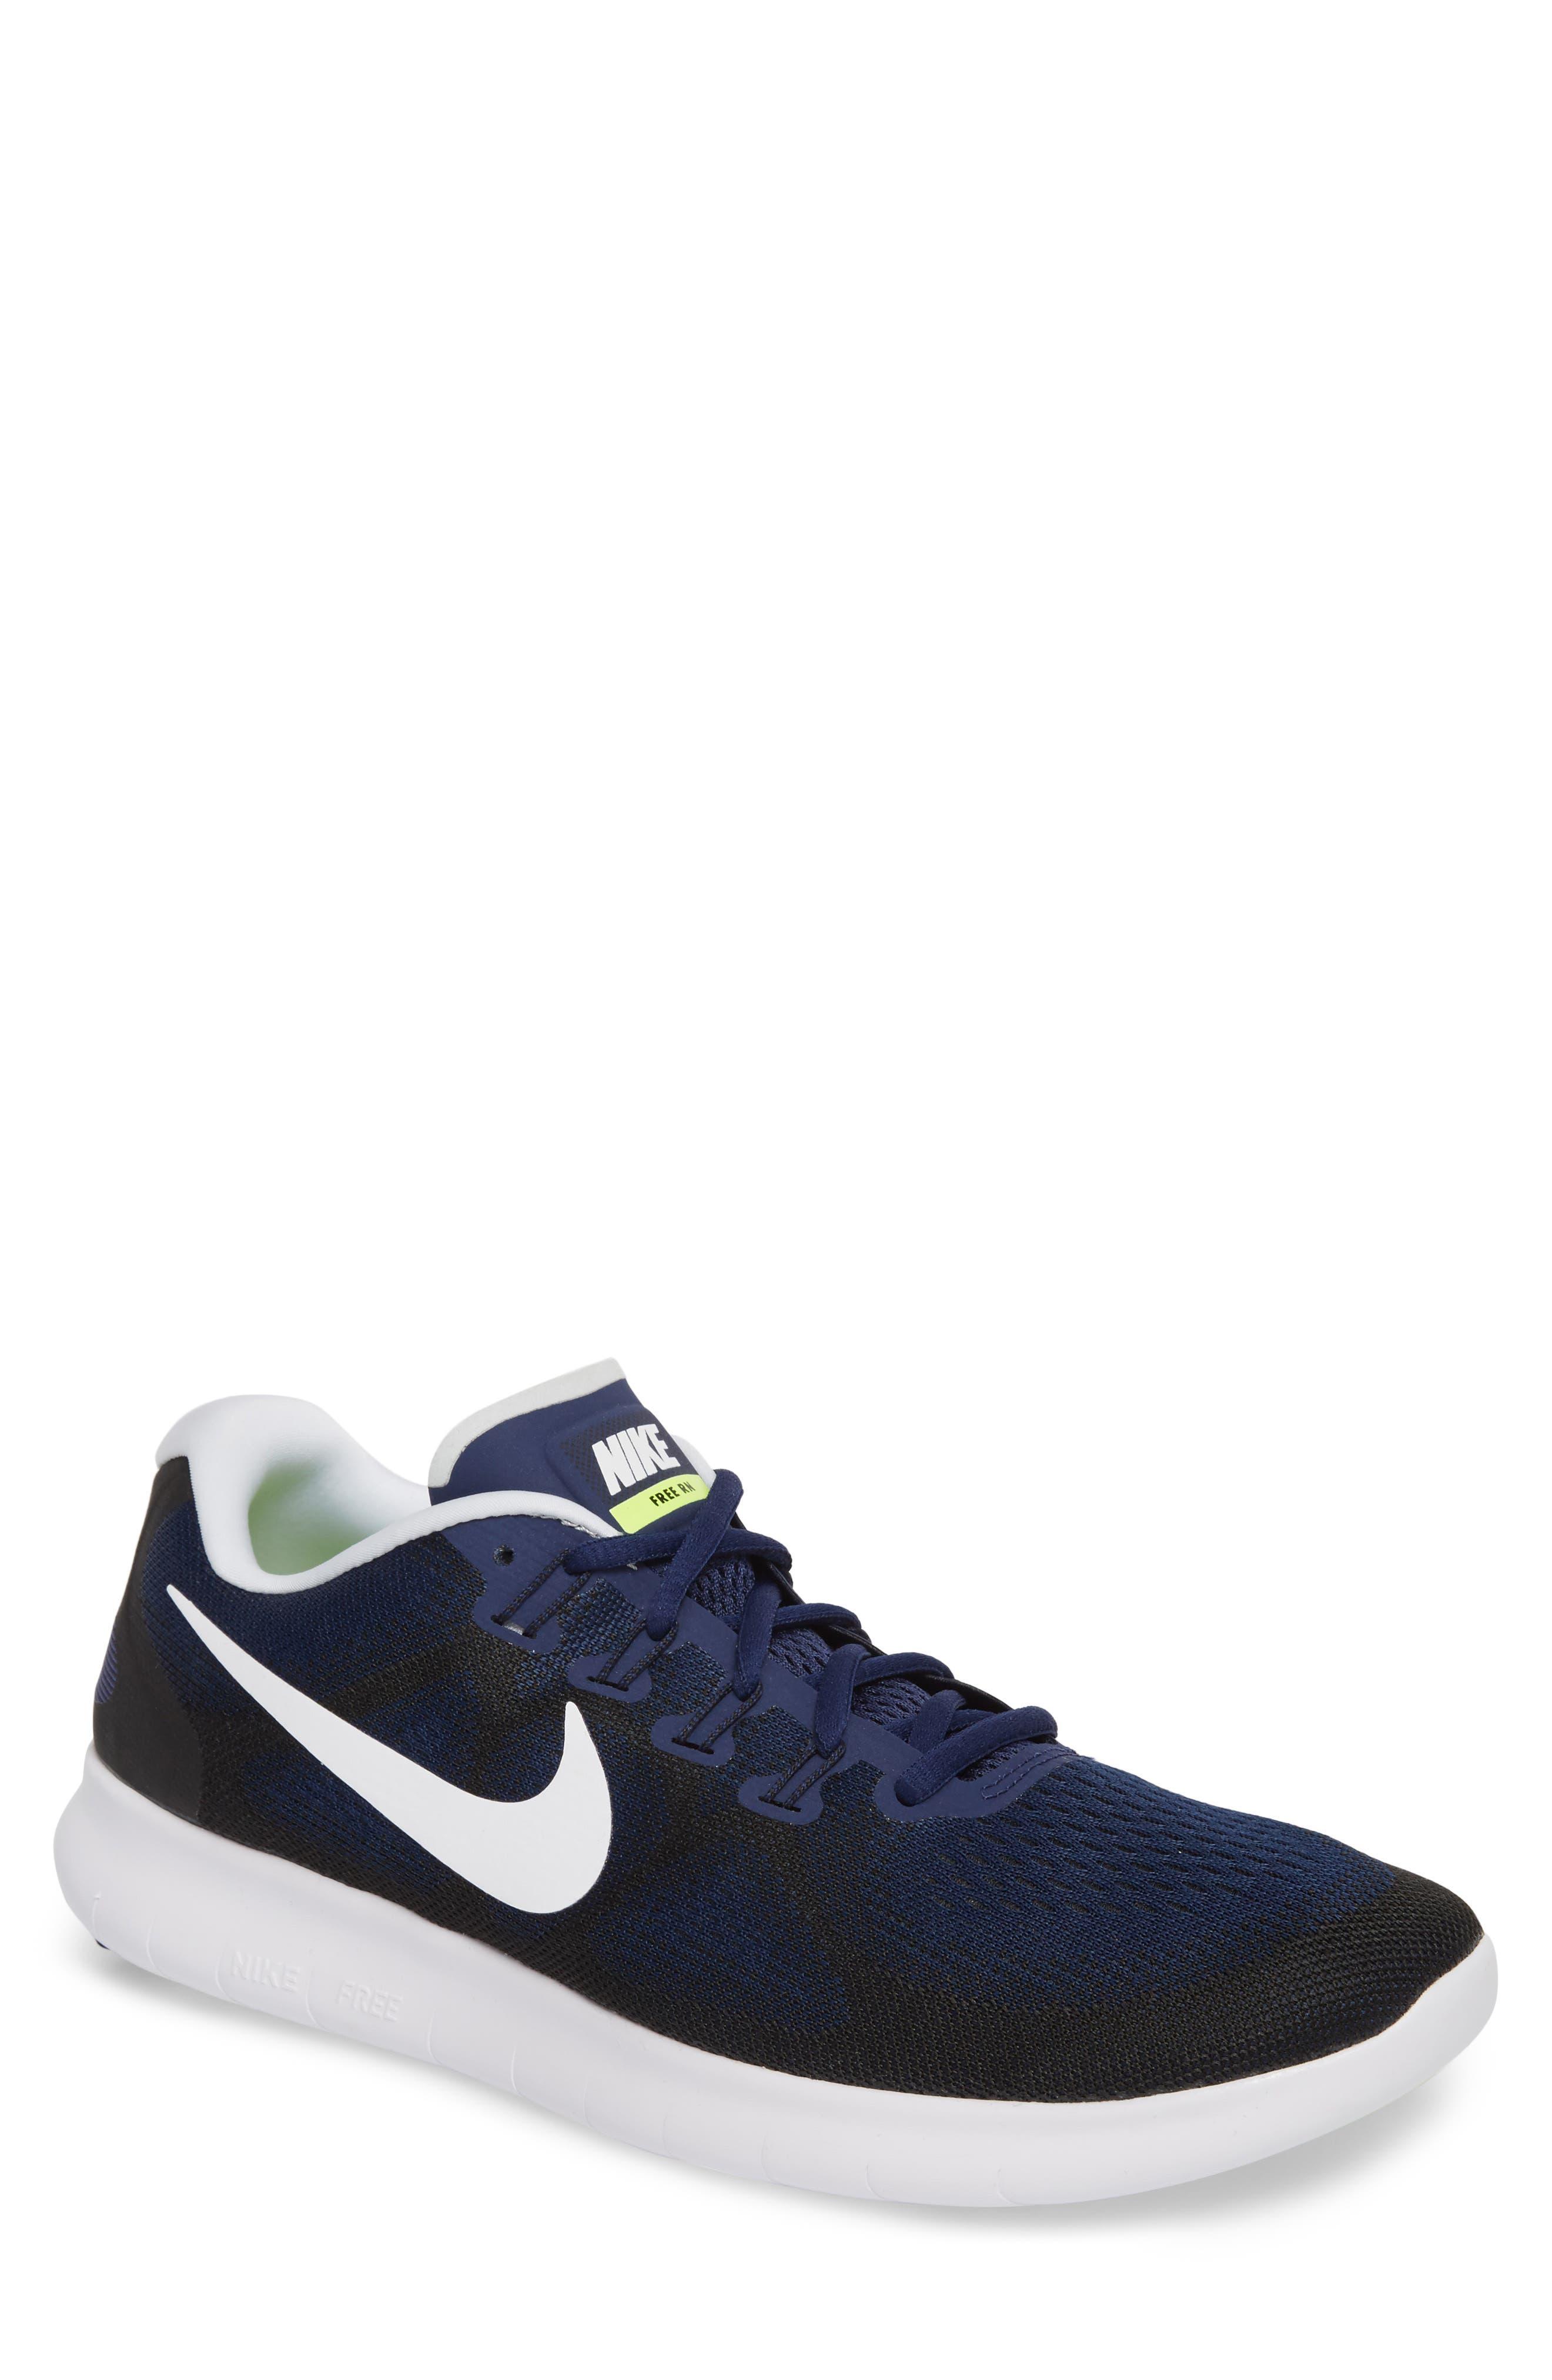 Nike Free Run 2017 Running Shoe (Men)